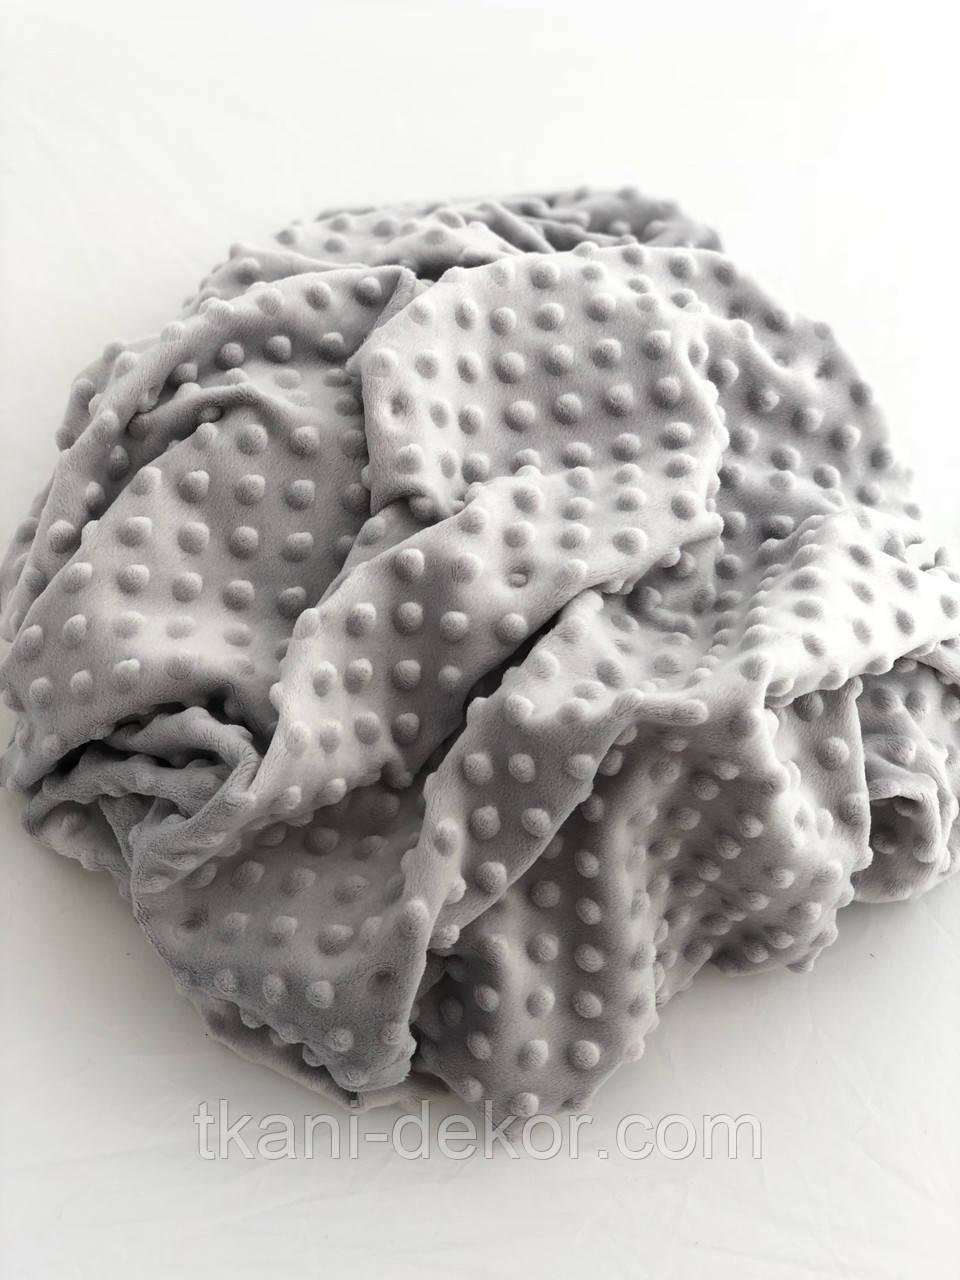 Плюшевая ткань Minky светло-серого цвета (пупырка)